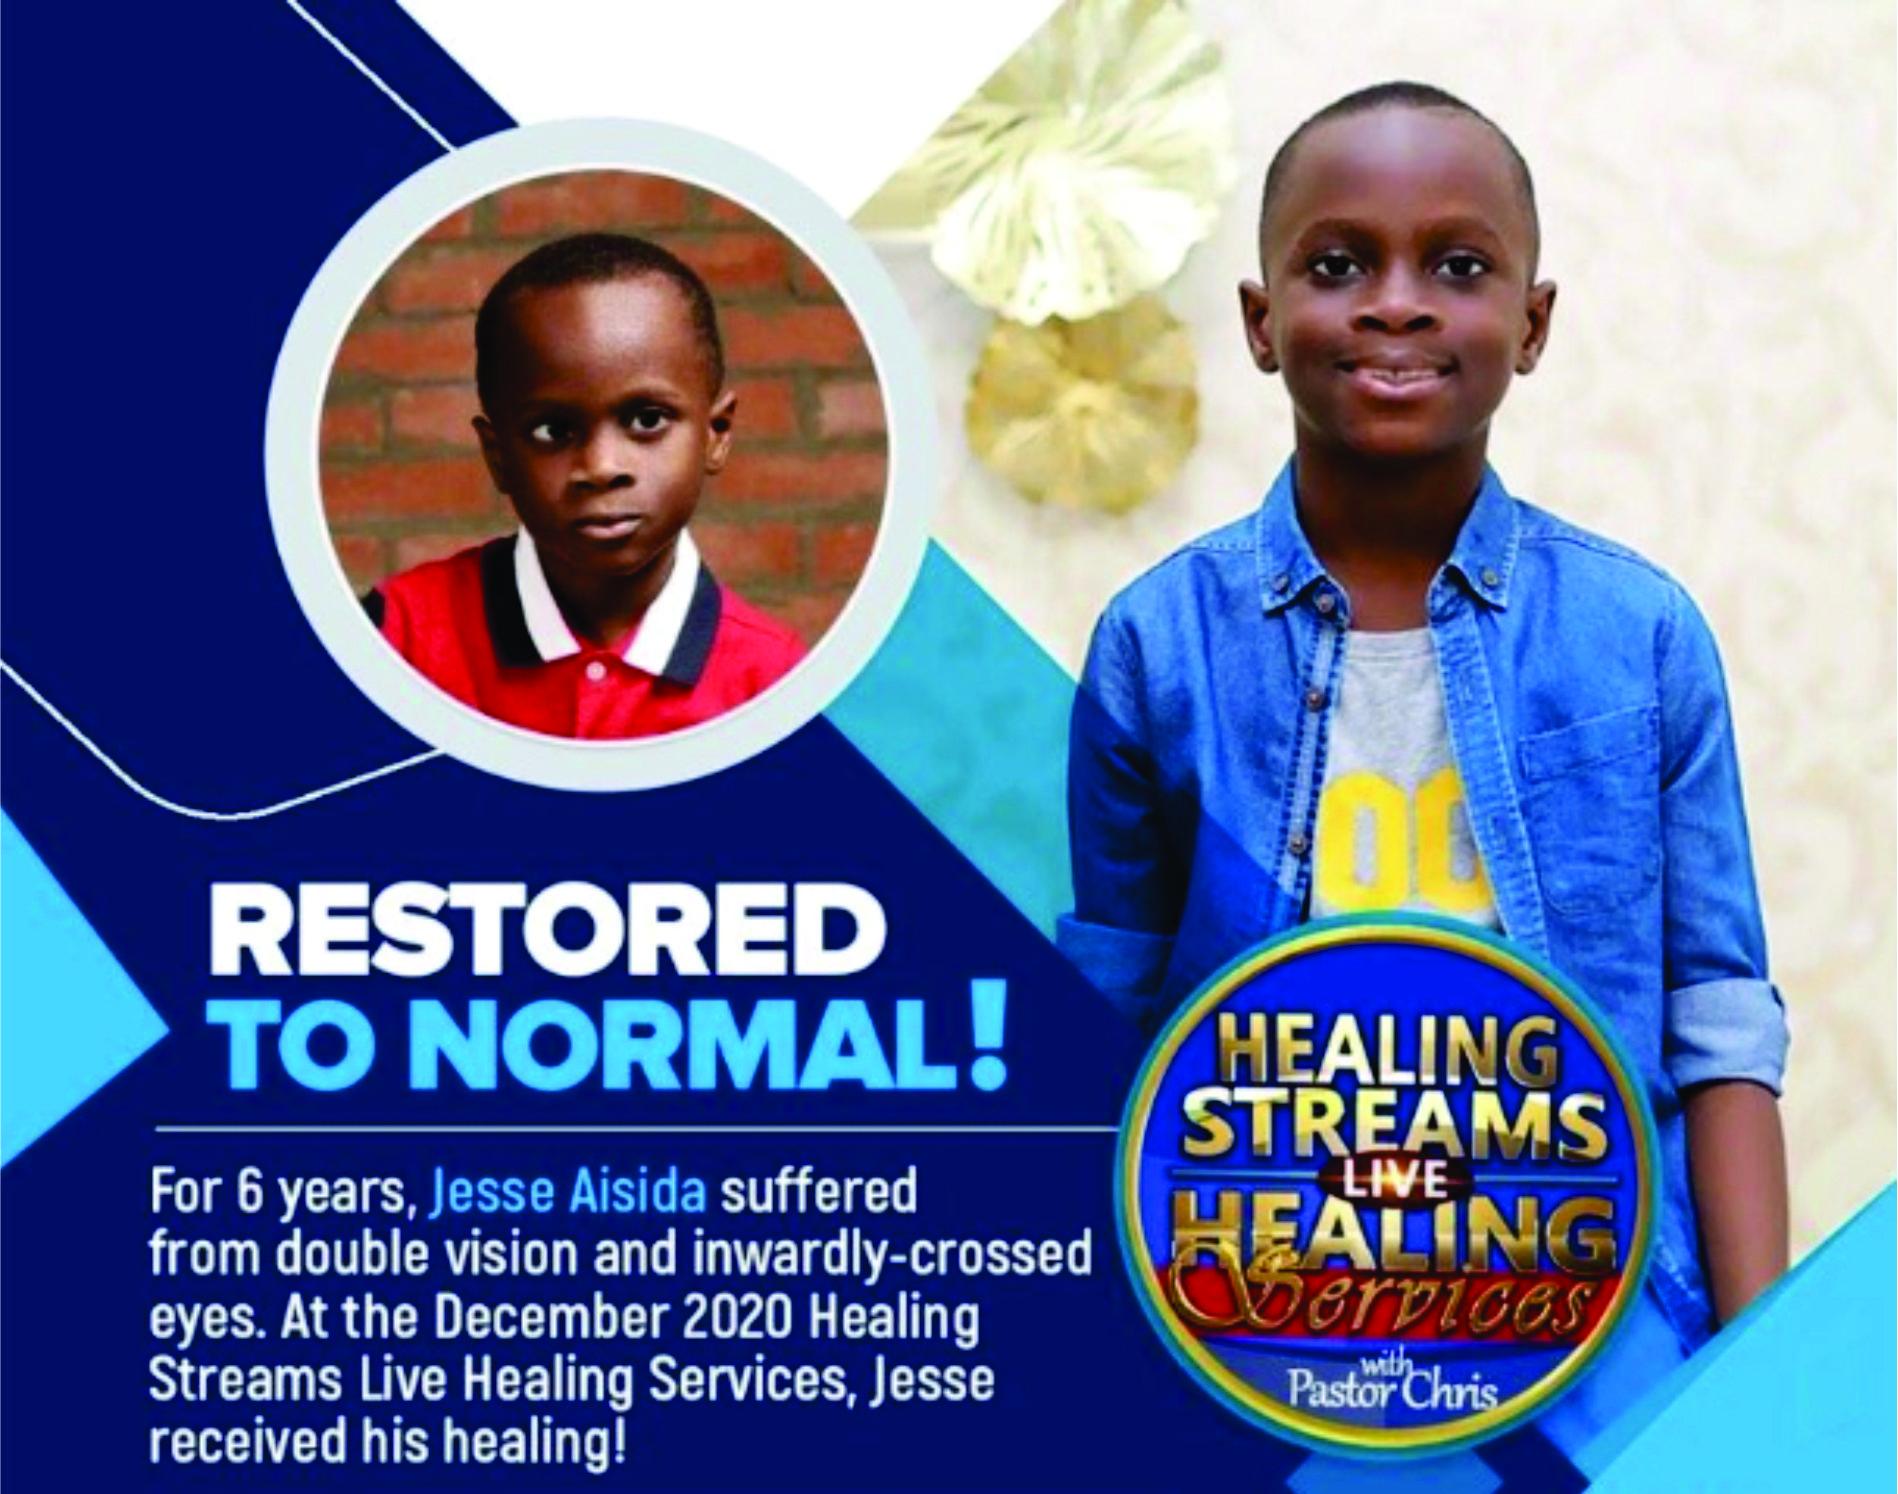 Healing-streams-testimony-2.jpg